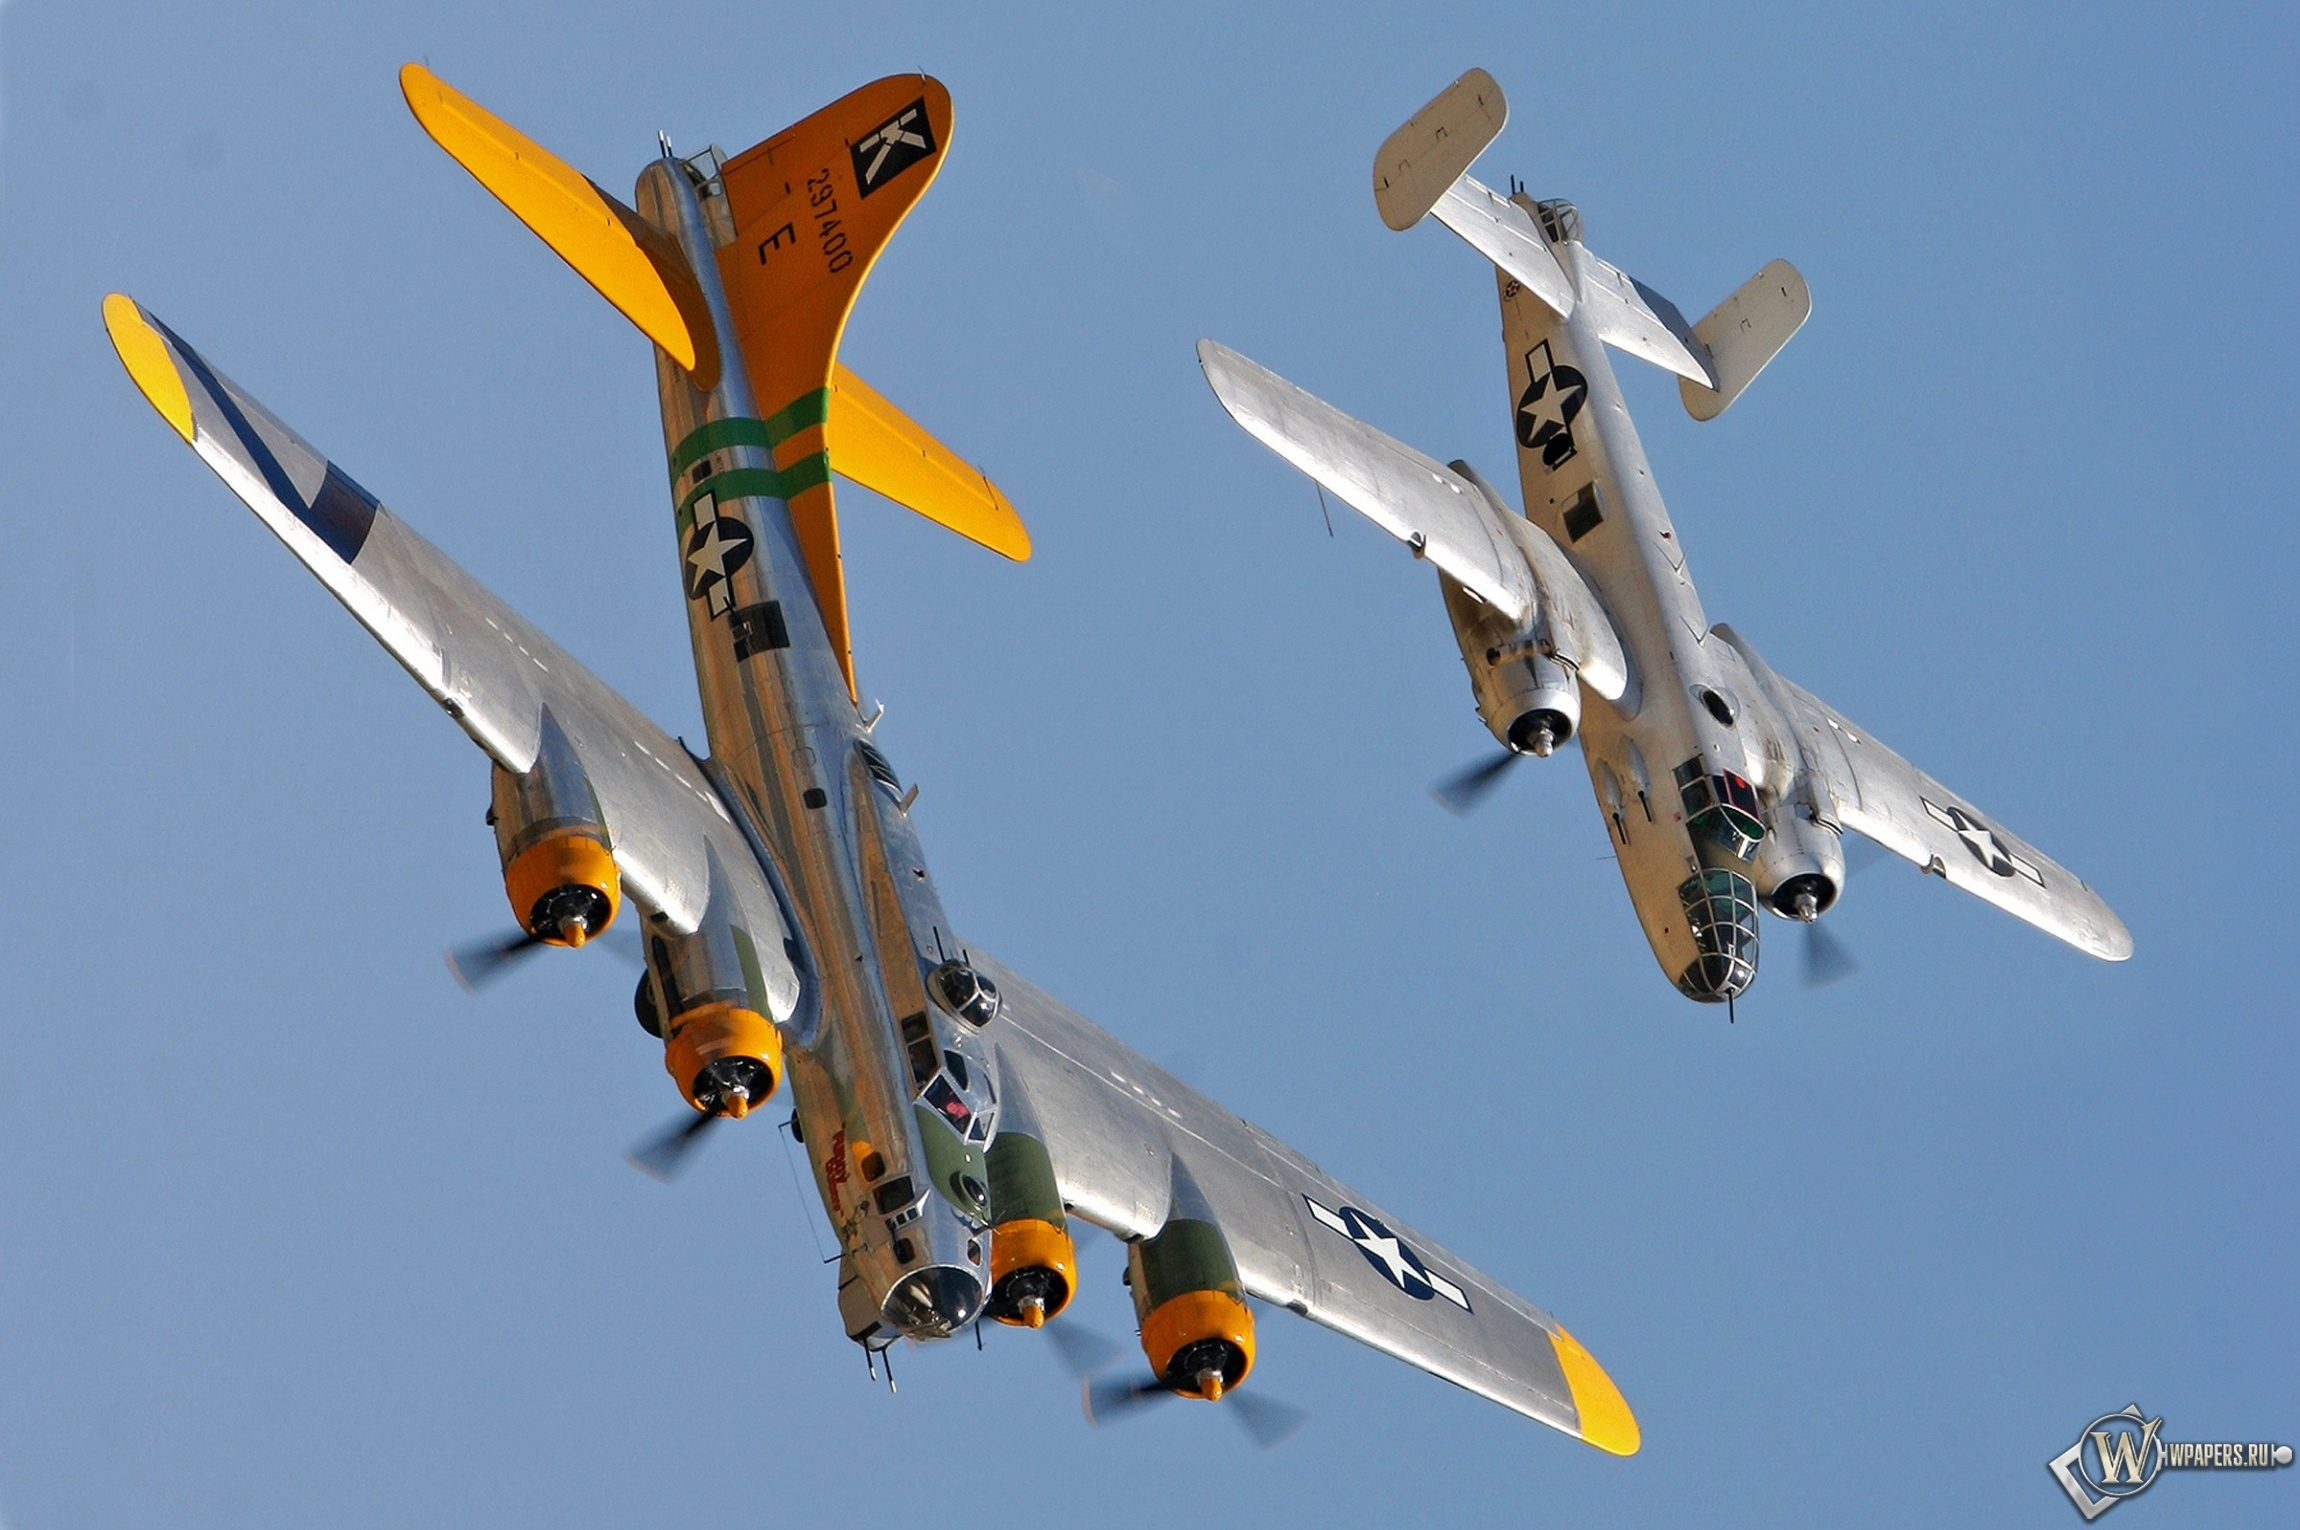 American Boeing B-17 и B-25 2300x1530